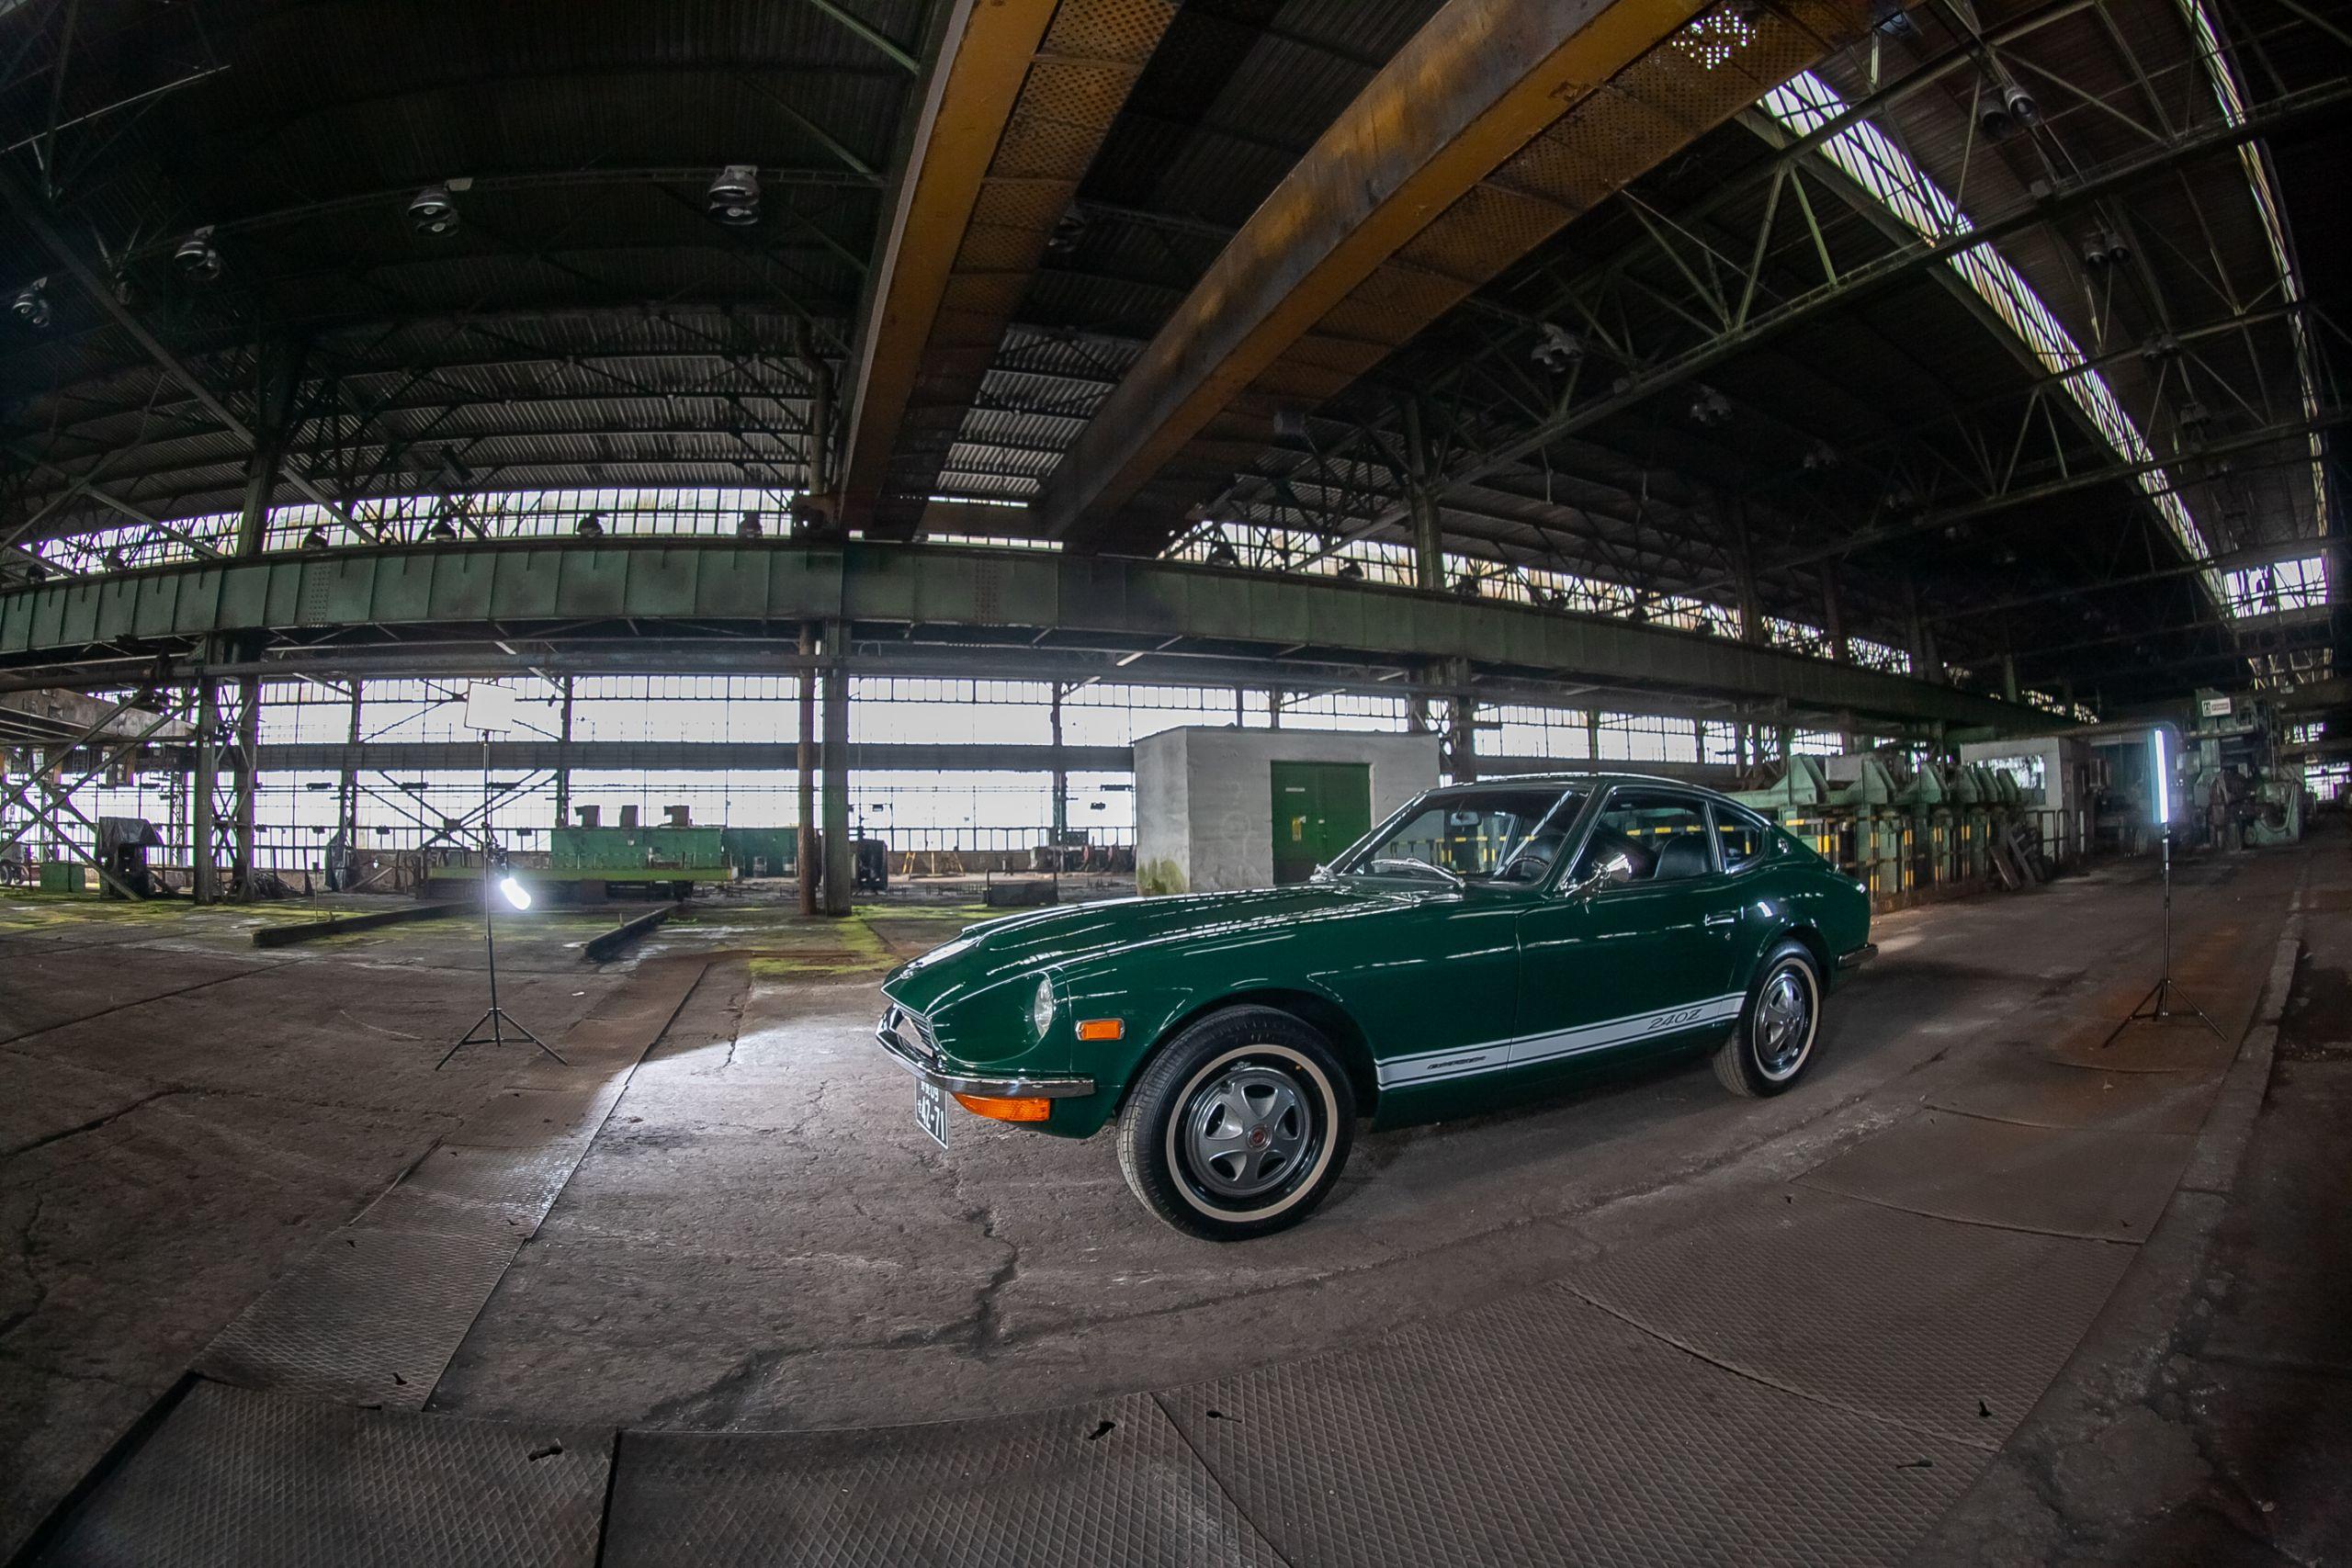 Original Datsun 240z for sale